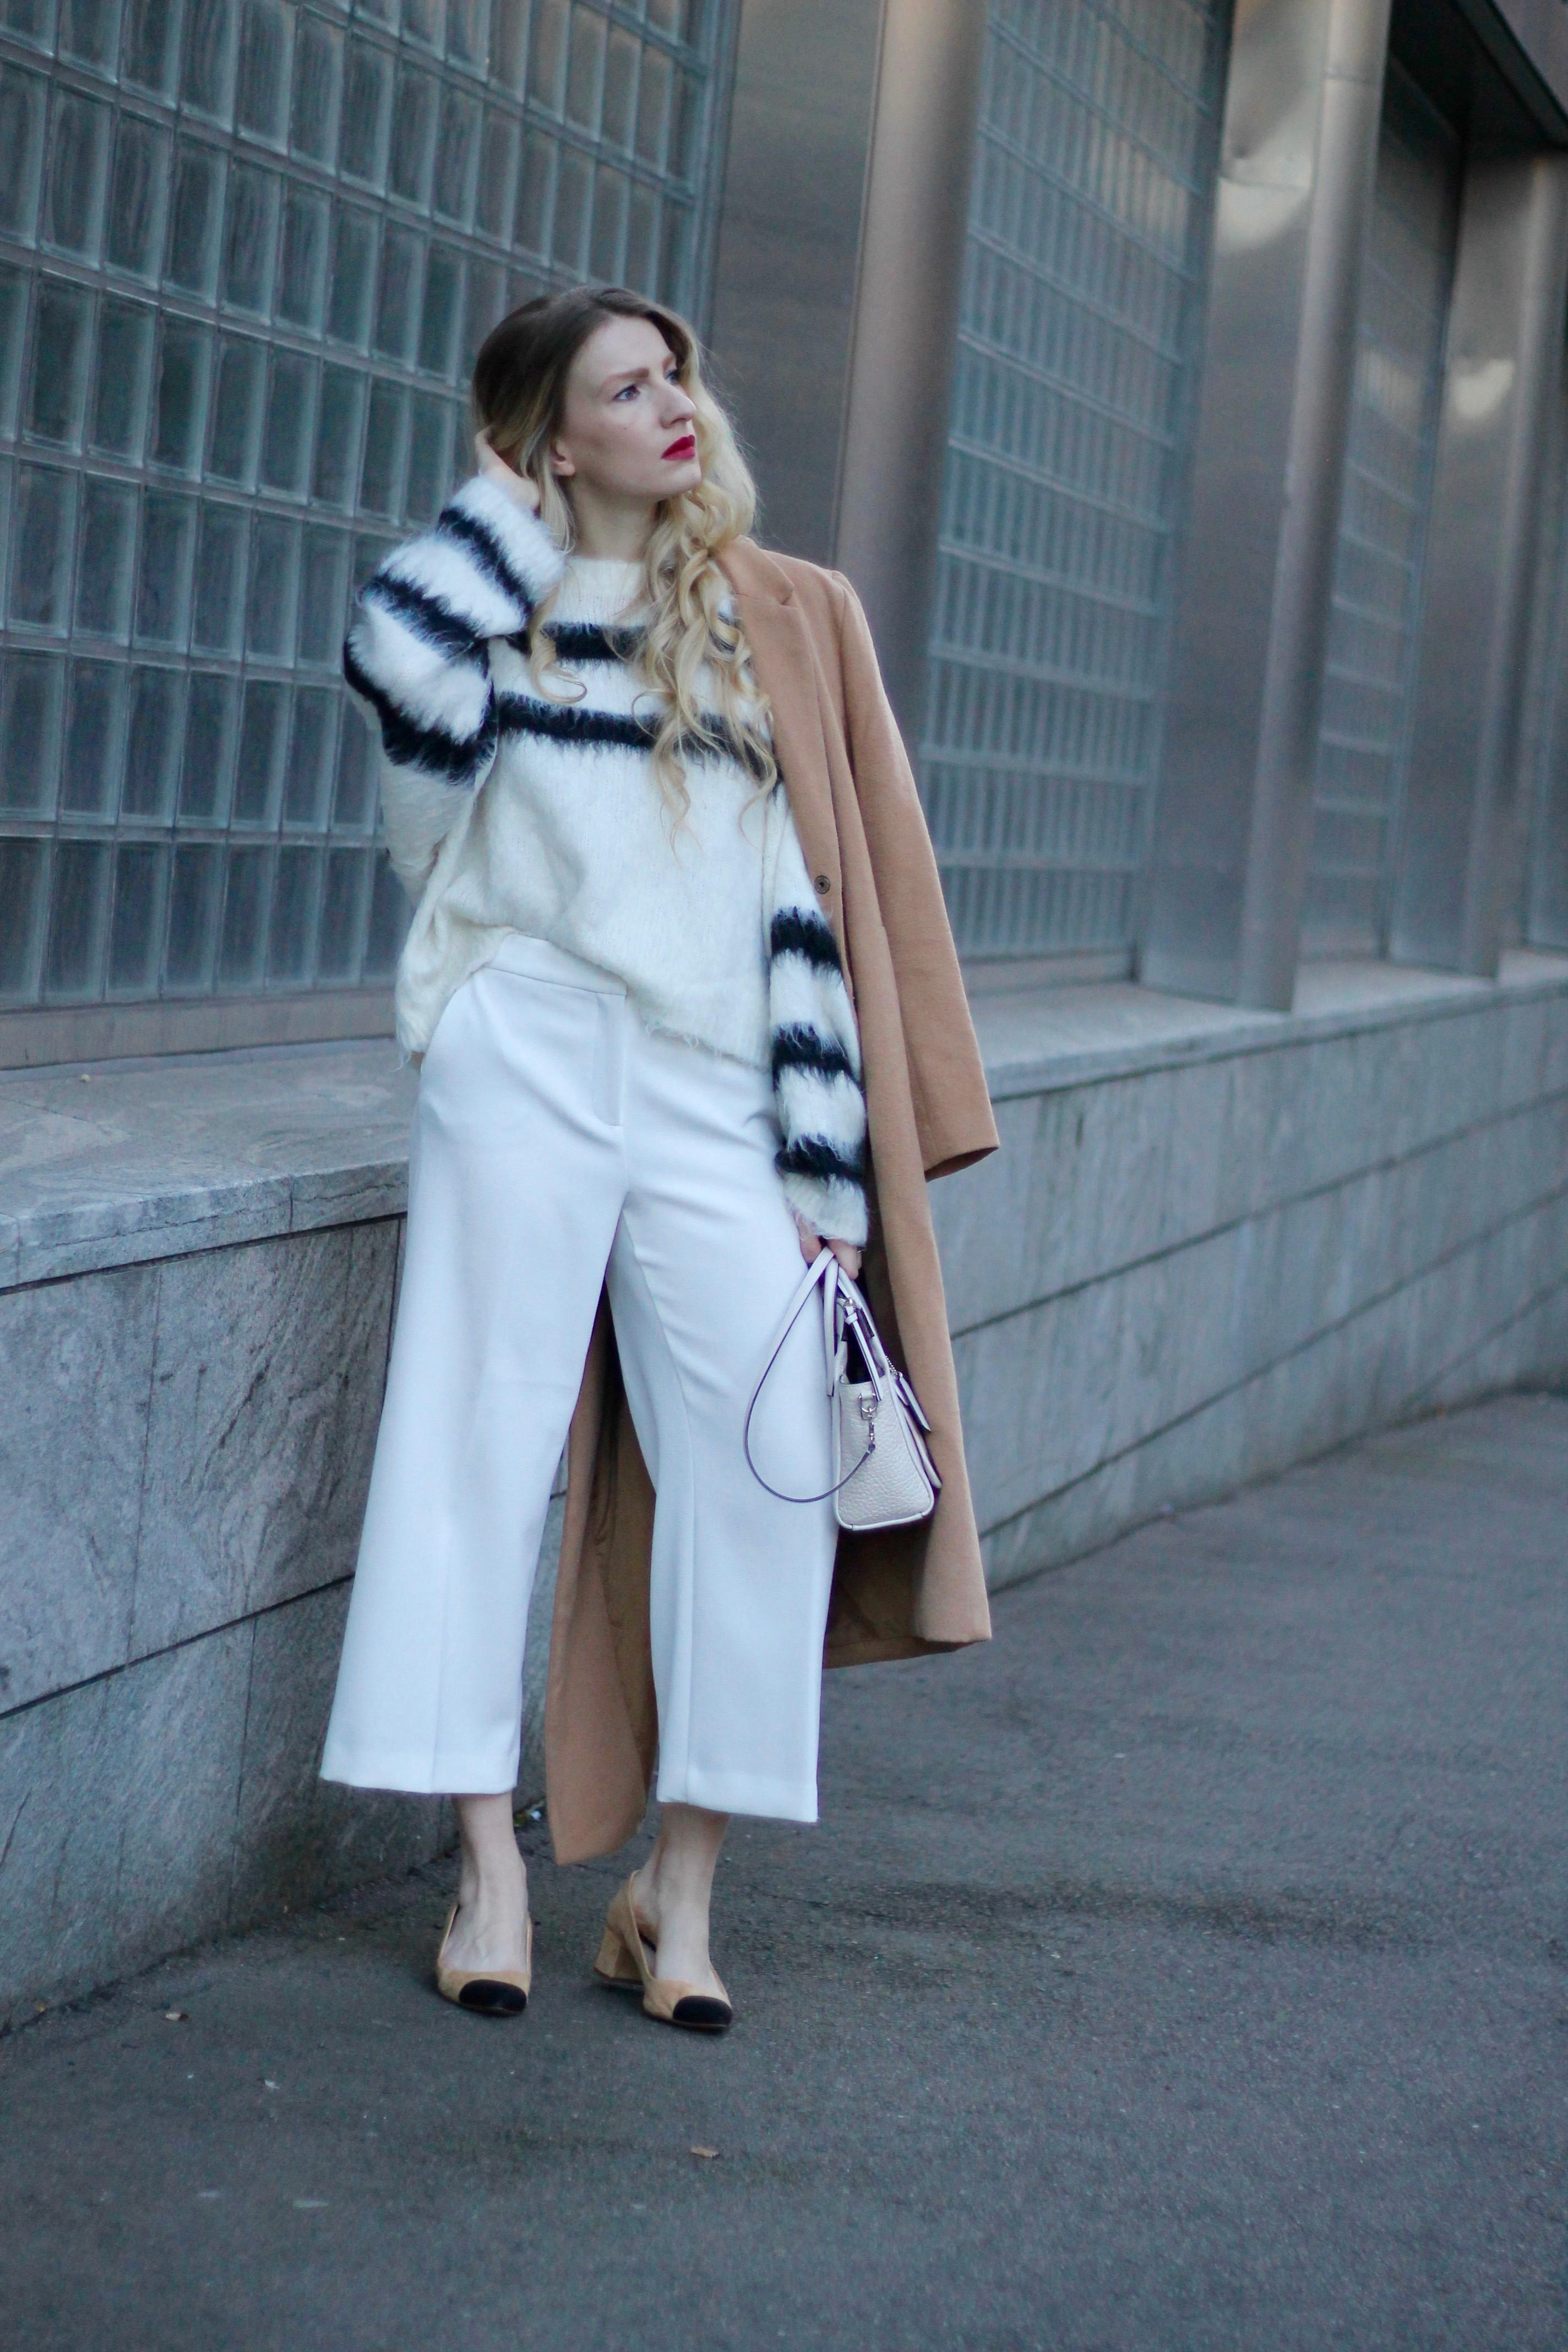 MON MODE | Fashion Blogger | Berlin Street Style | Oslo | Monochrome Vibes | Culottes